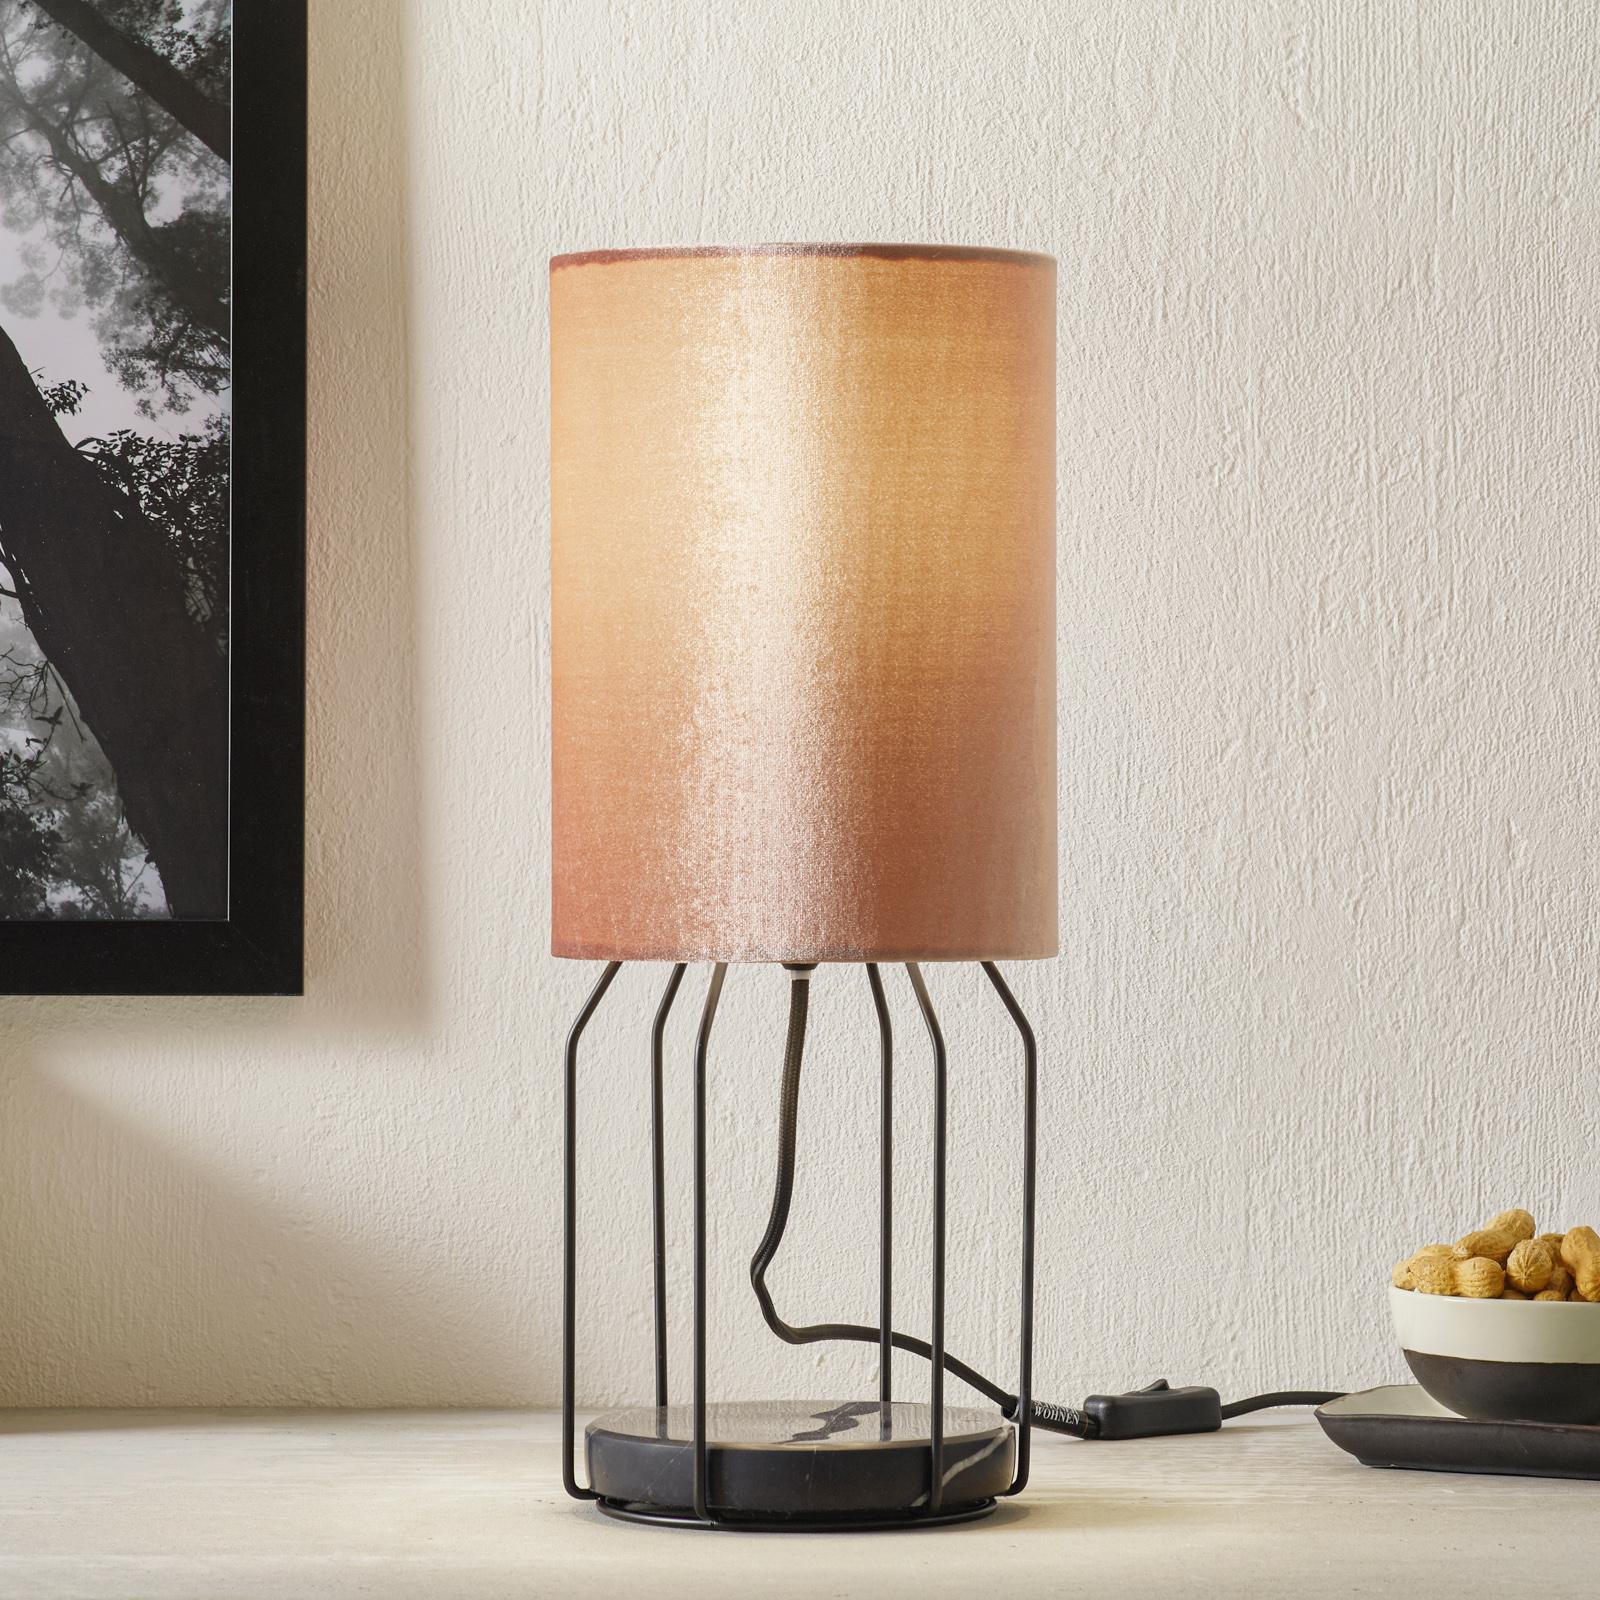 Schöner Wohnen Grace lampe à poser rosée